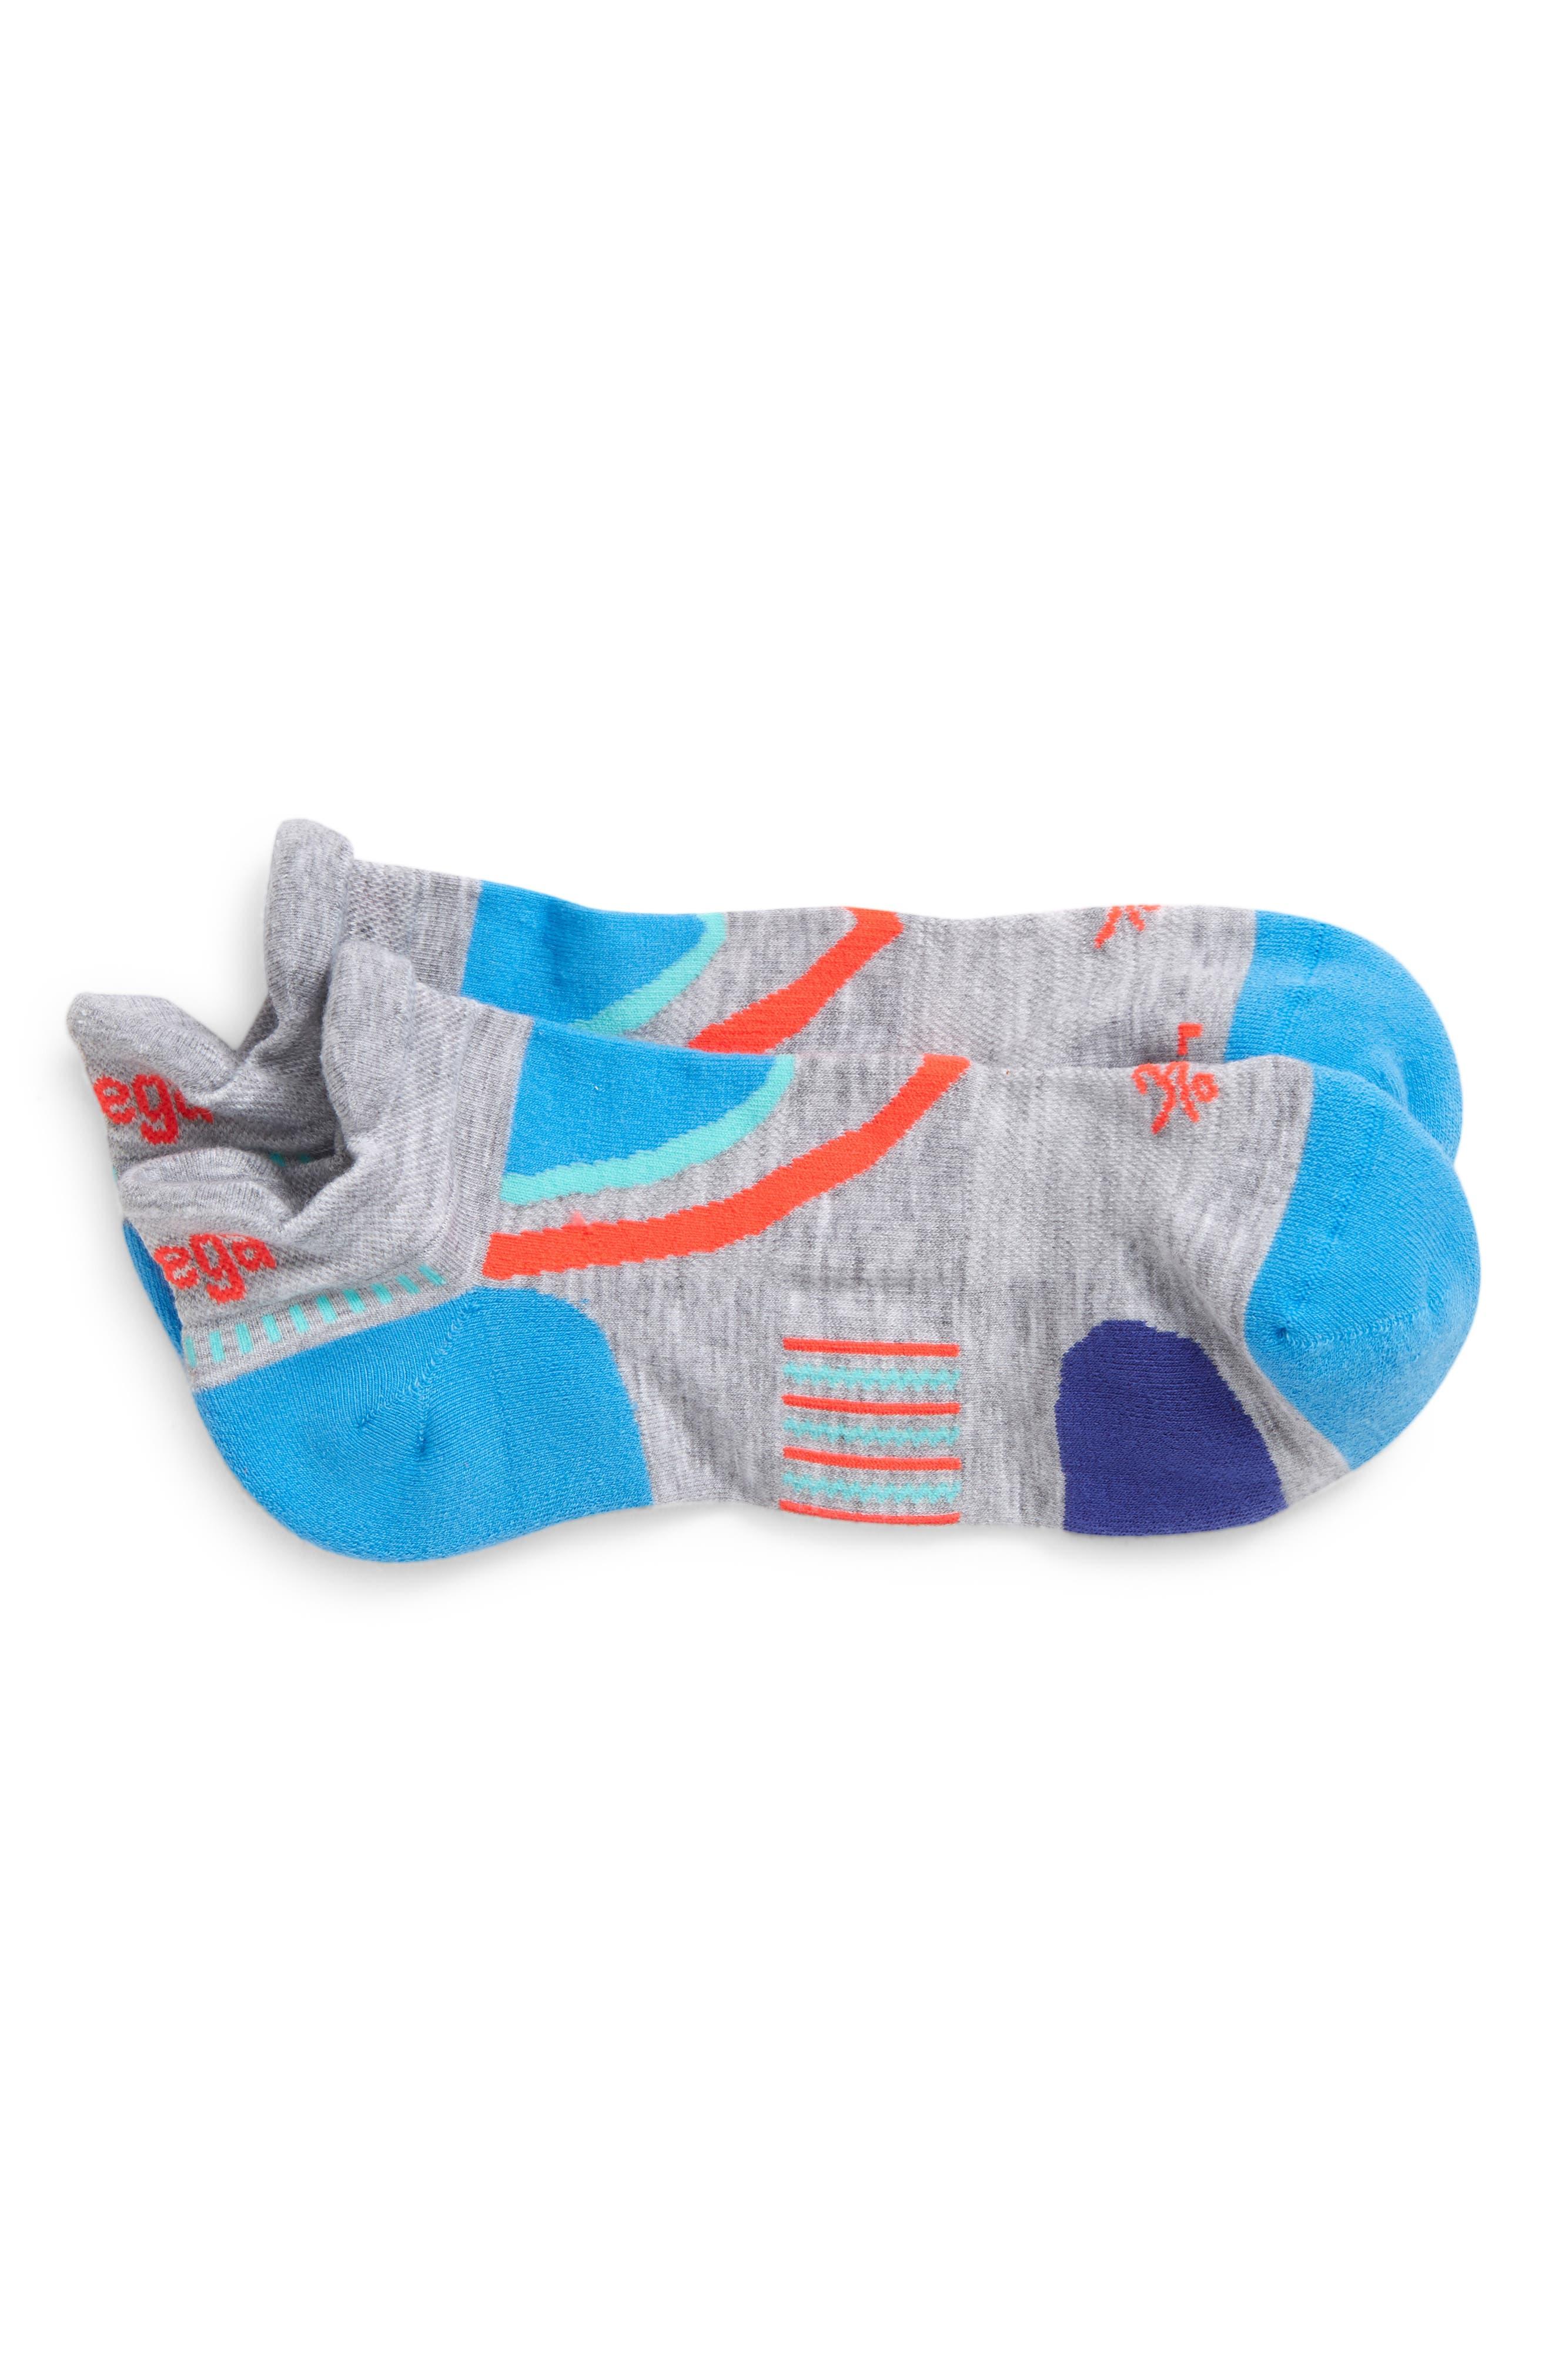 Ultraglide No-Show Socks